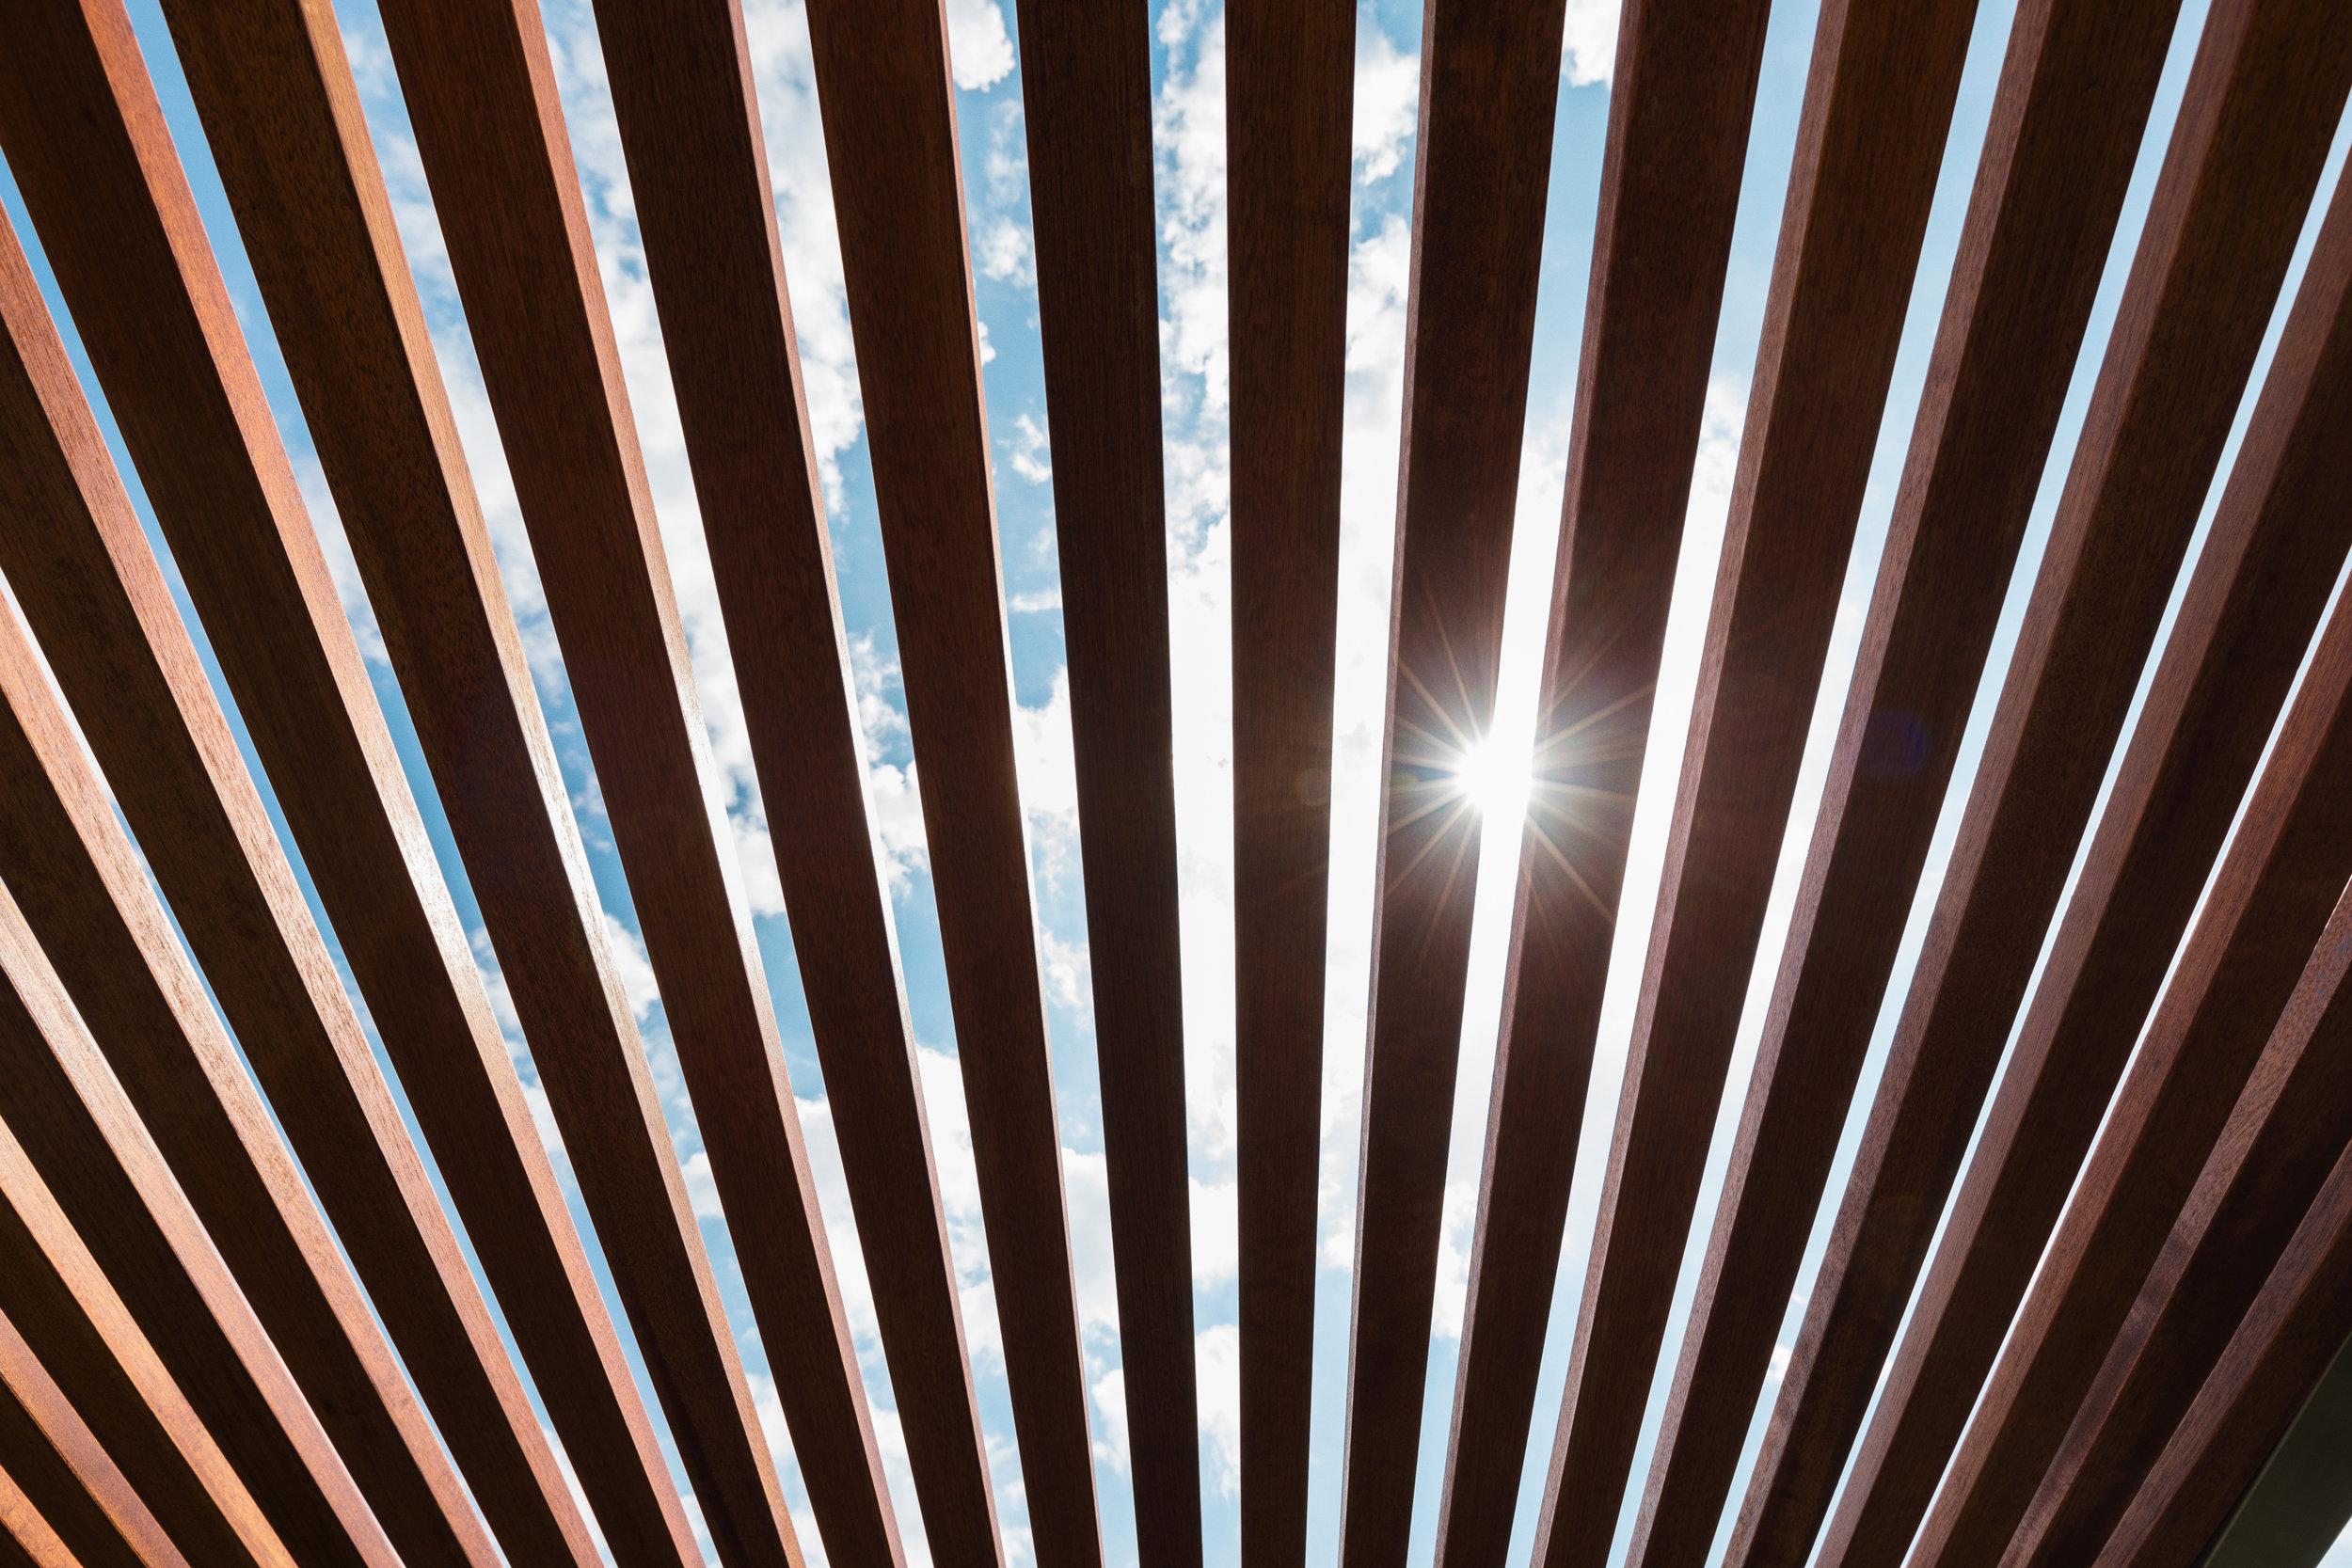 rewalux Material Holz für Pergola.jpg